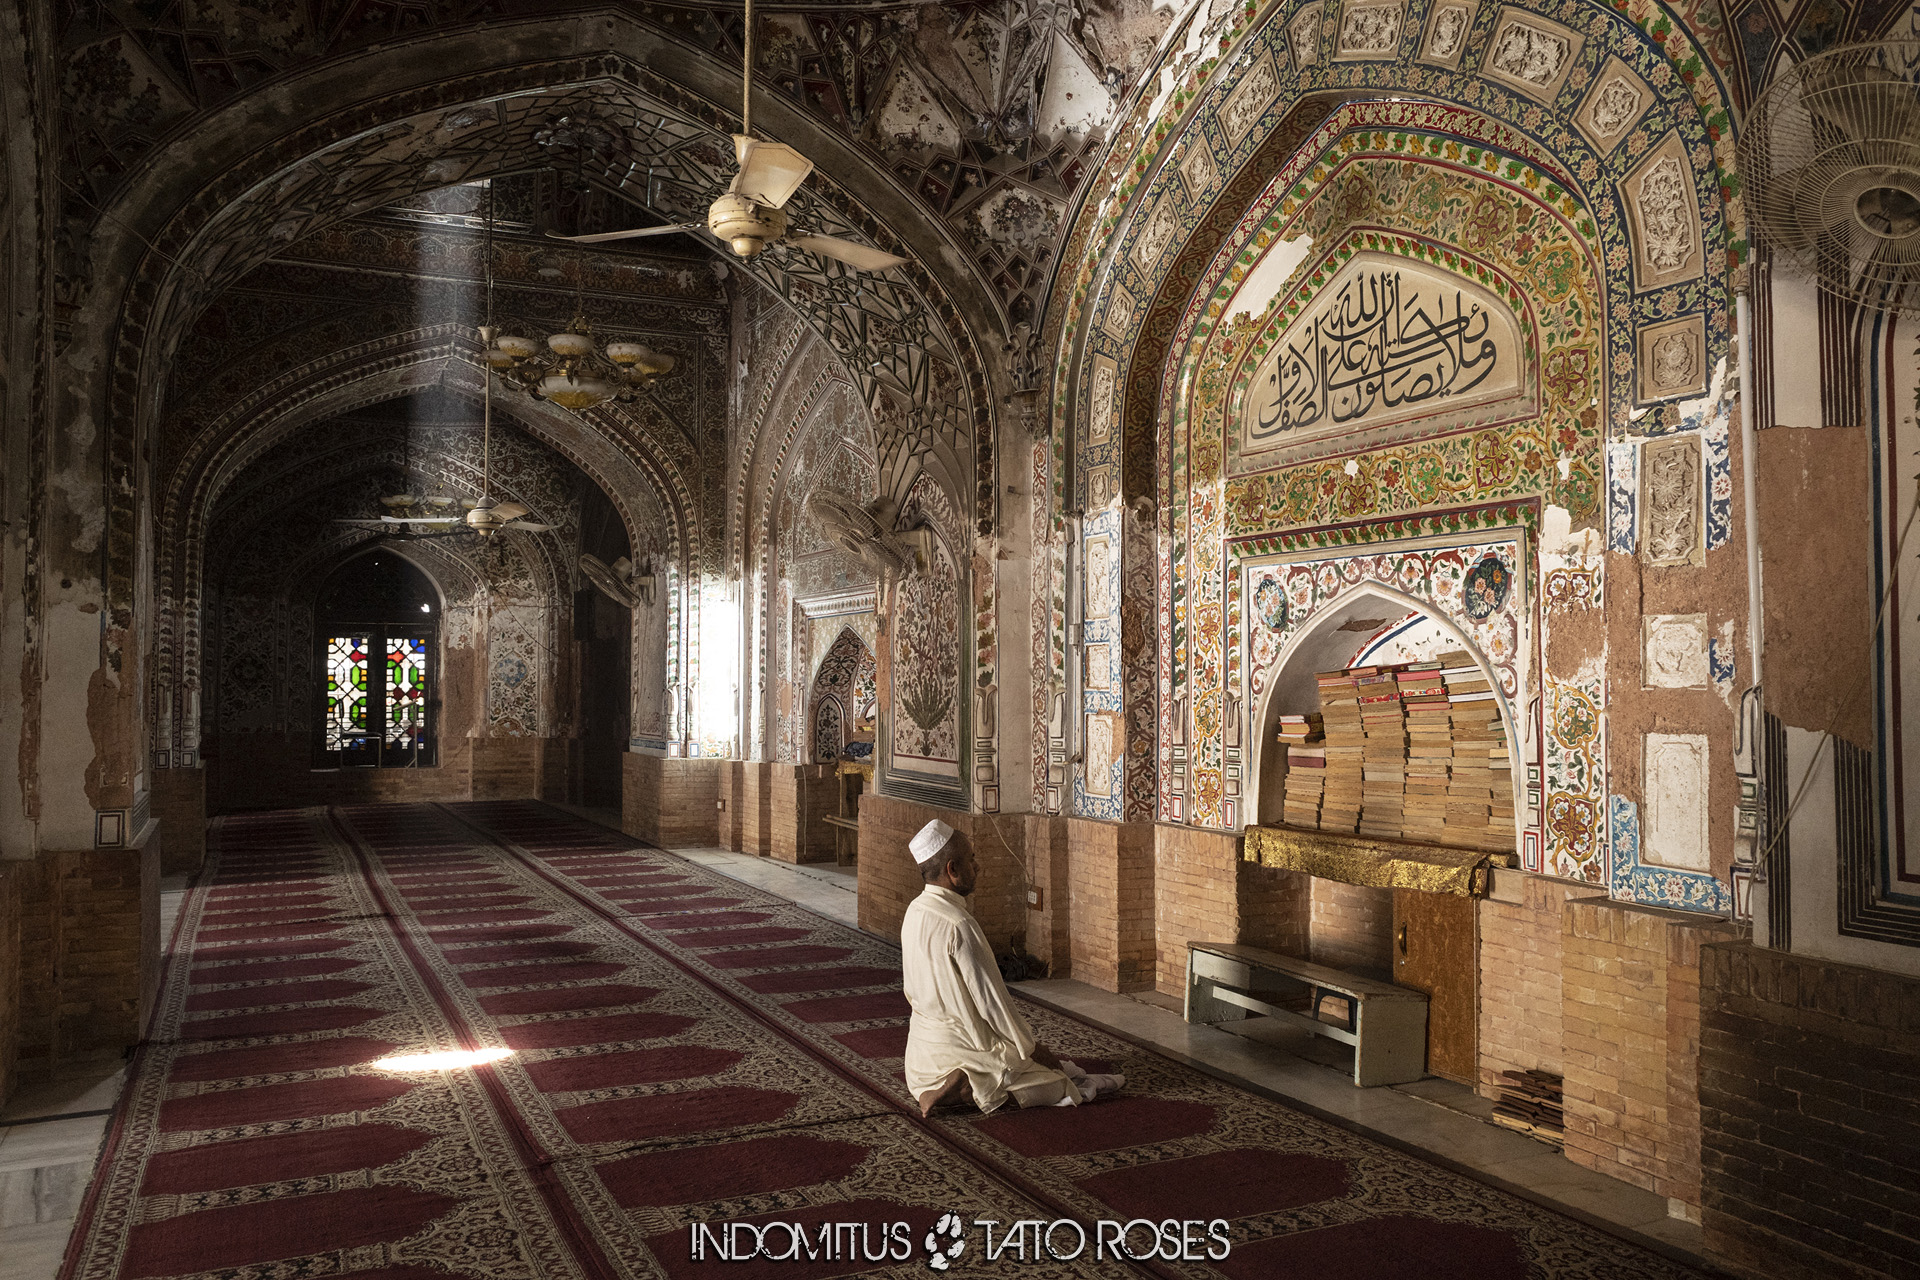 Pakistán Mezquita Mahabat Khan, Peshawar